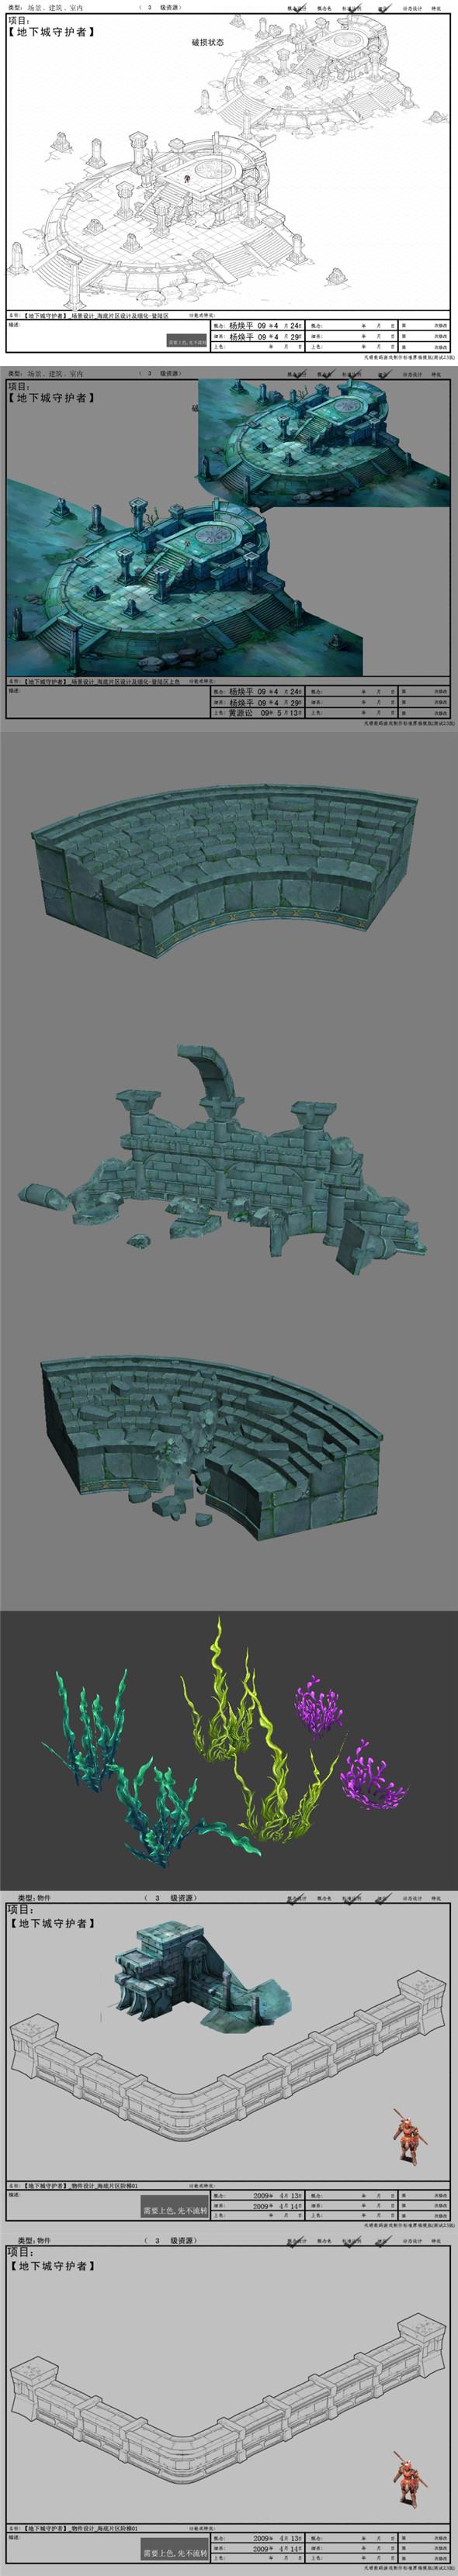 3DOcean Game model interior wall studs altar Arena Strait grass landing Edge Protectors 01 19851500